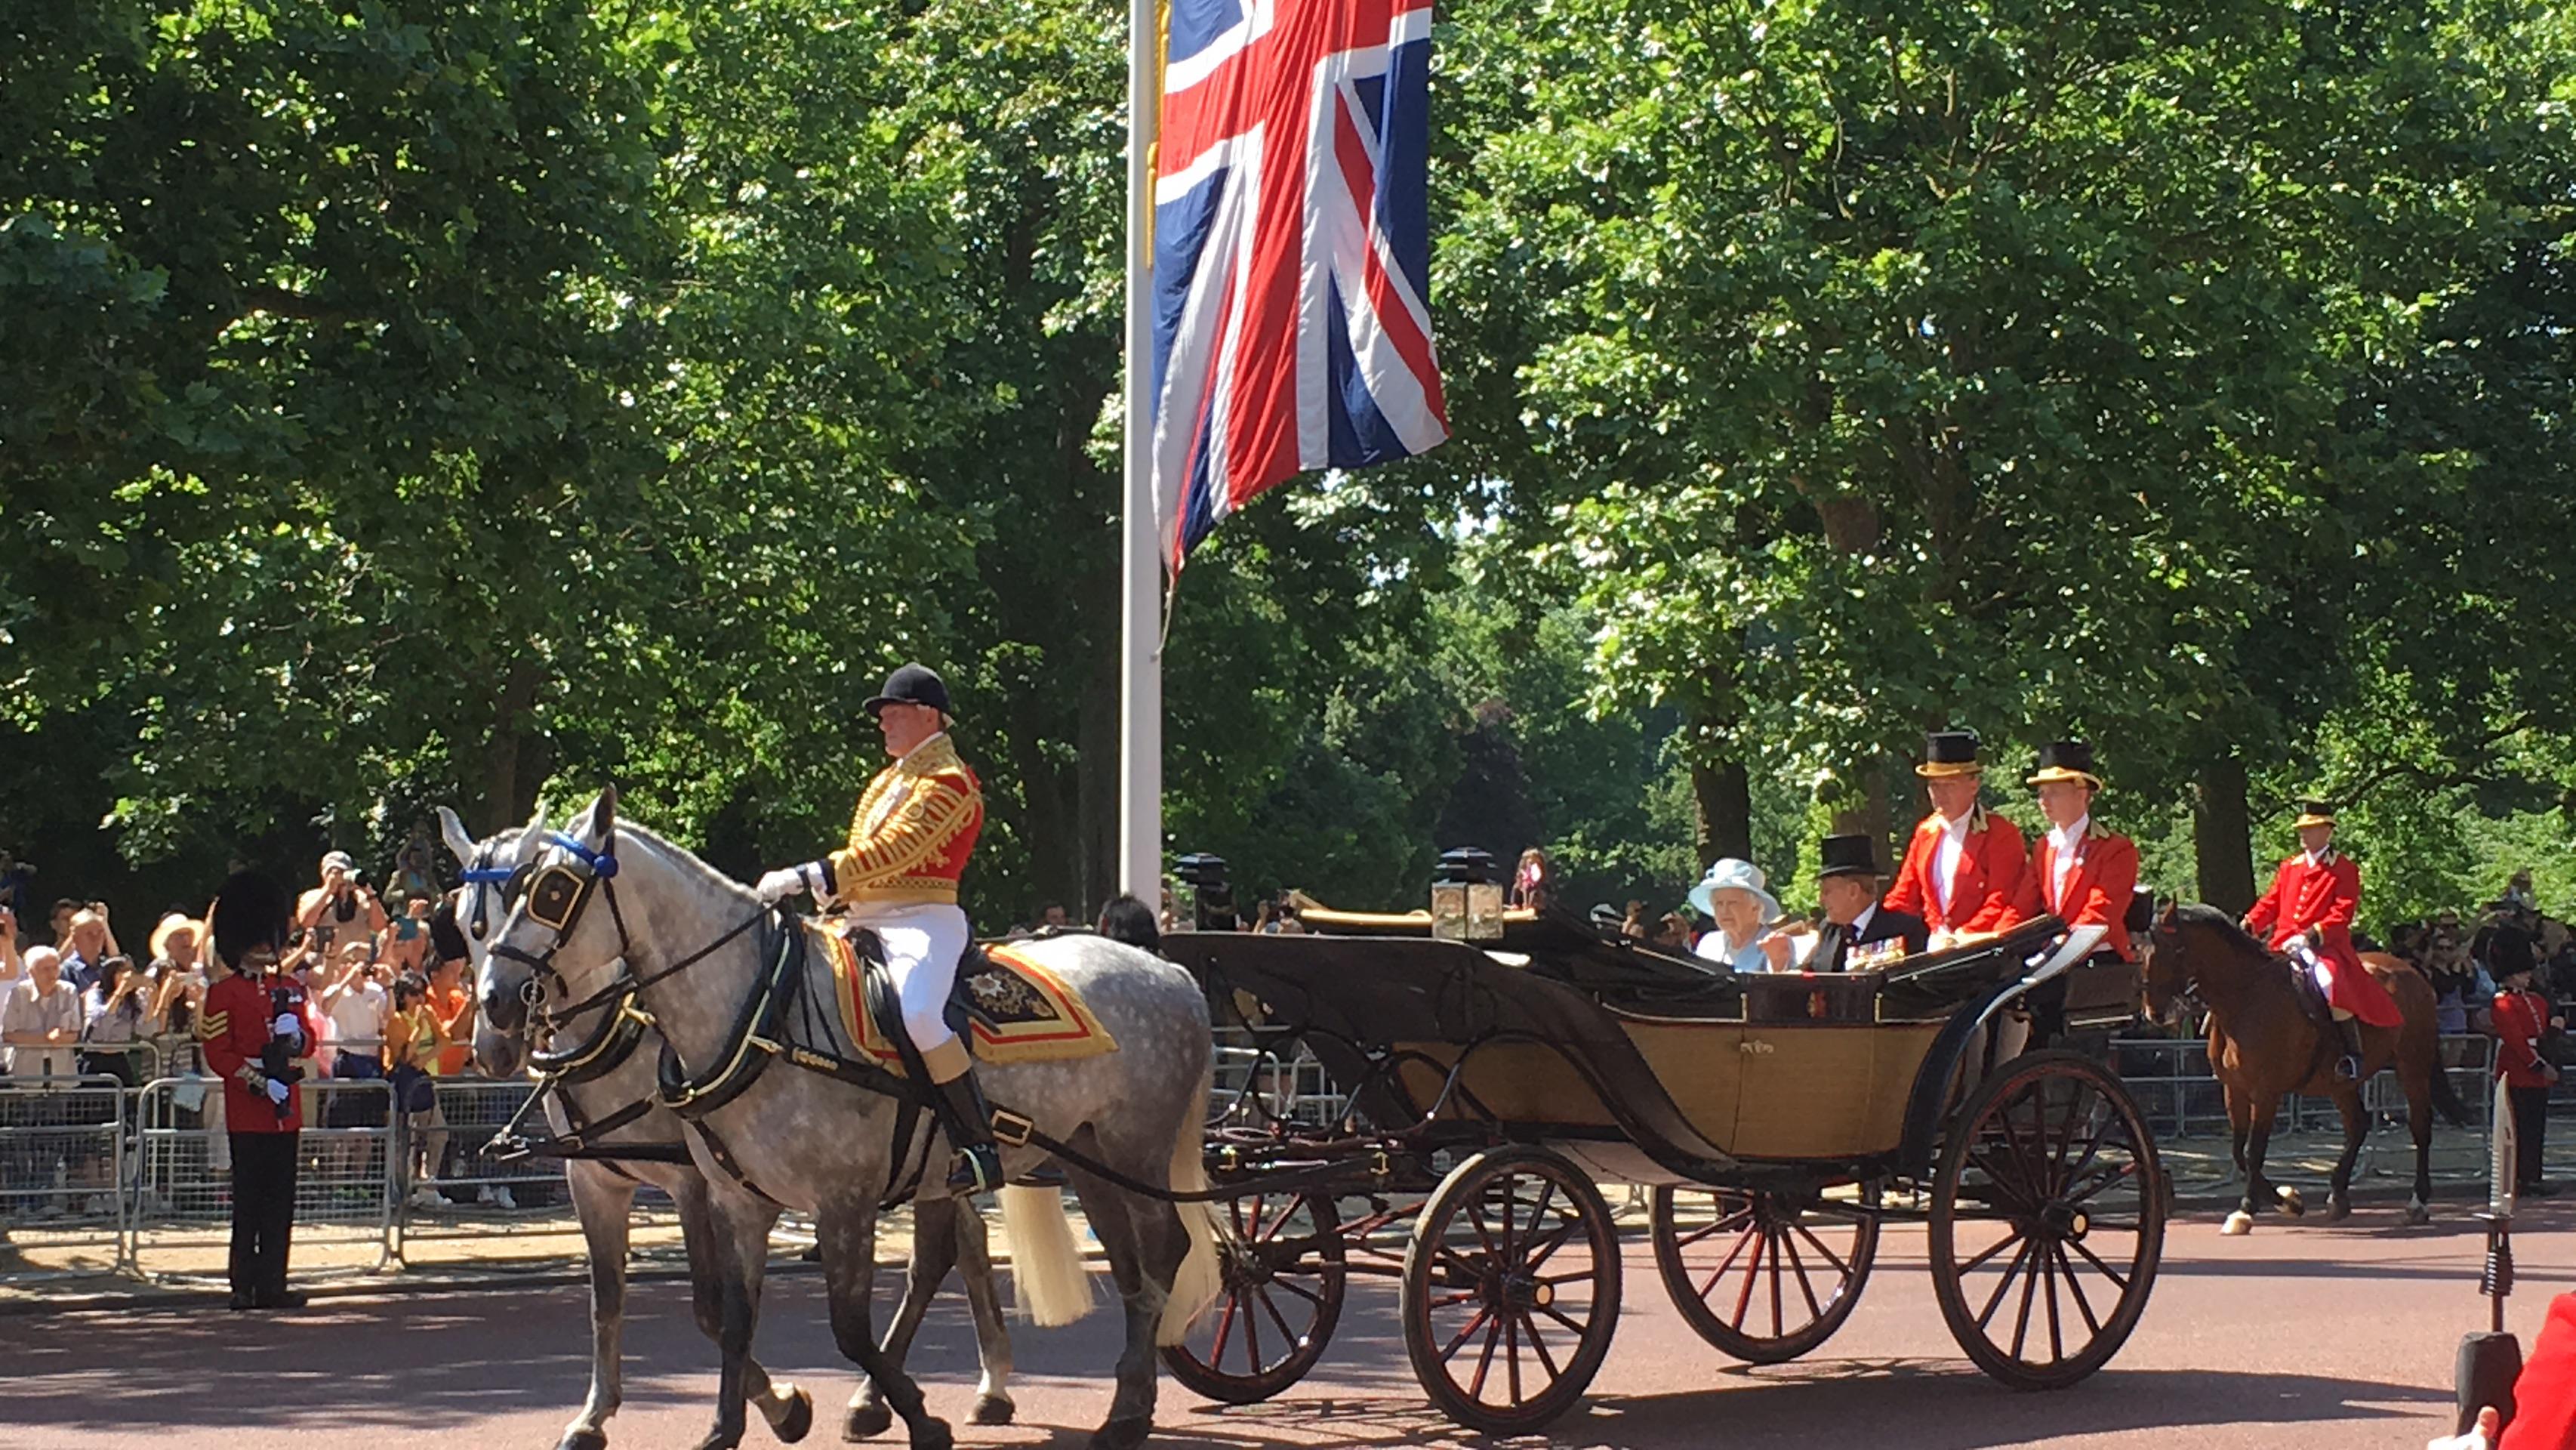 Queen's birthday celebrations